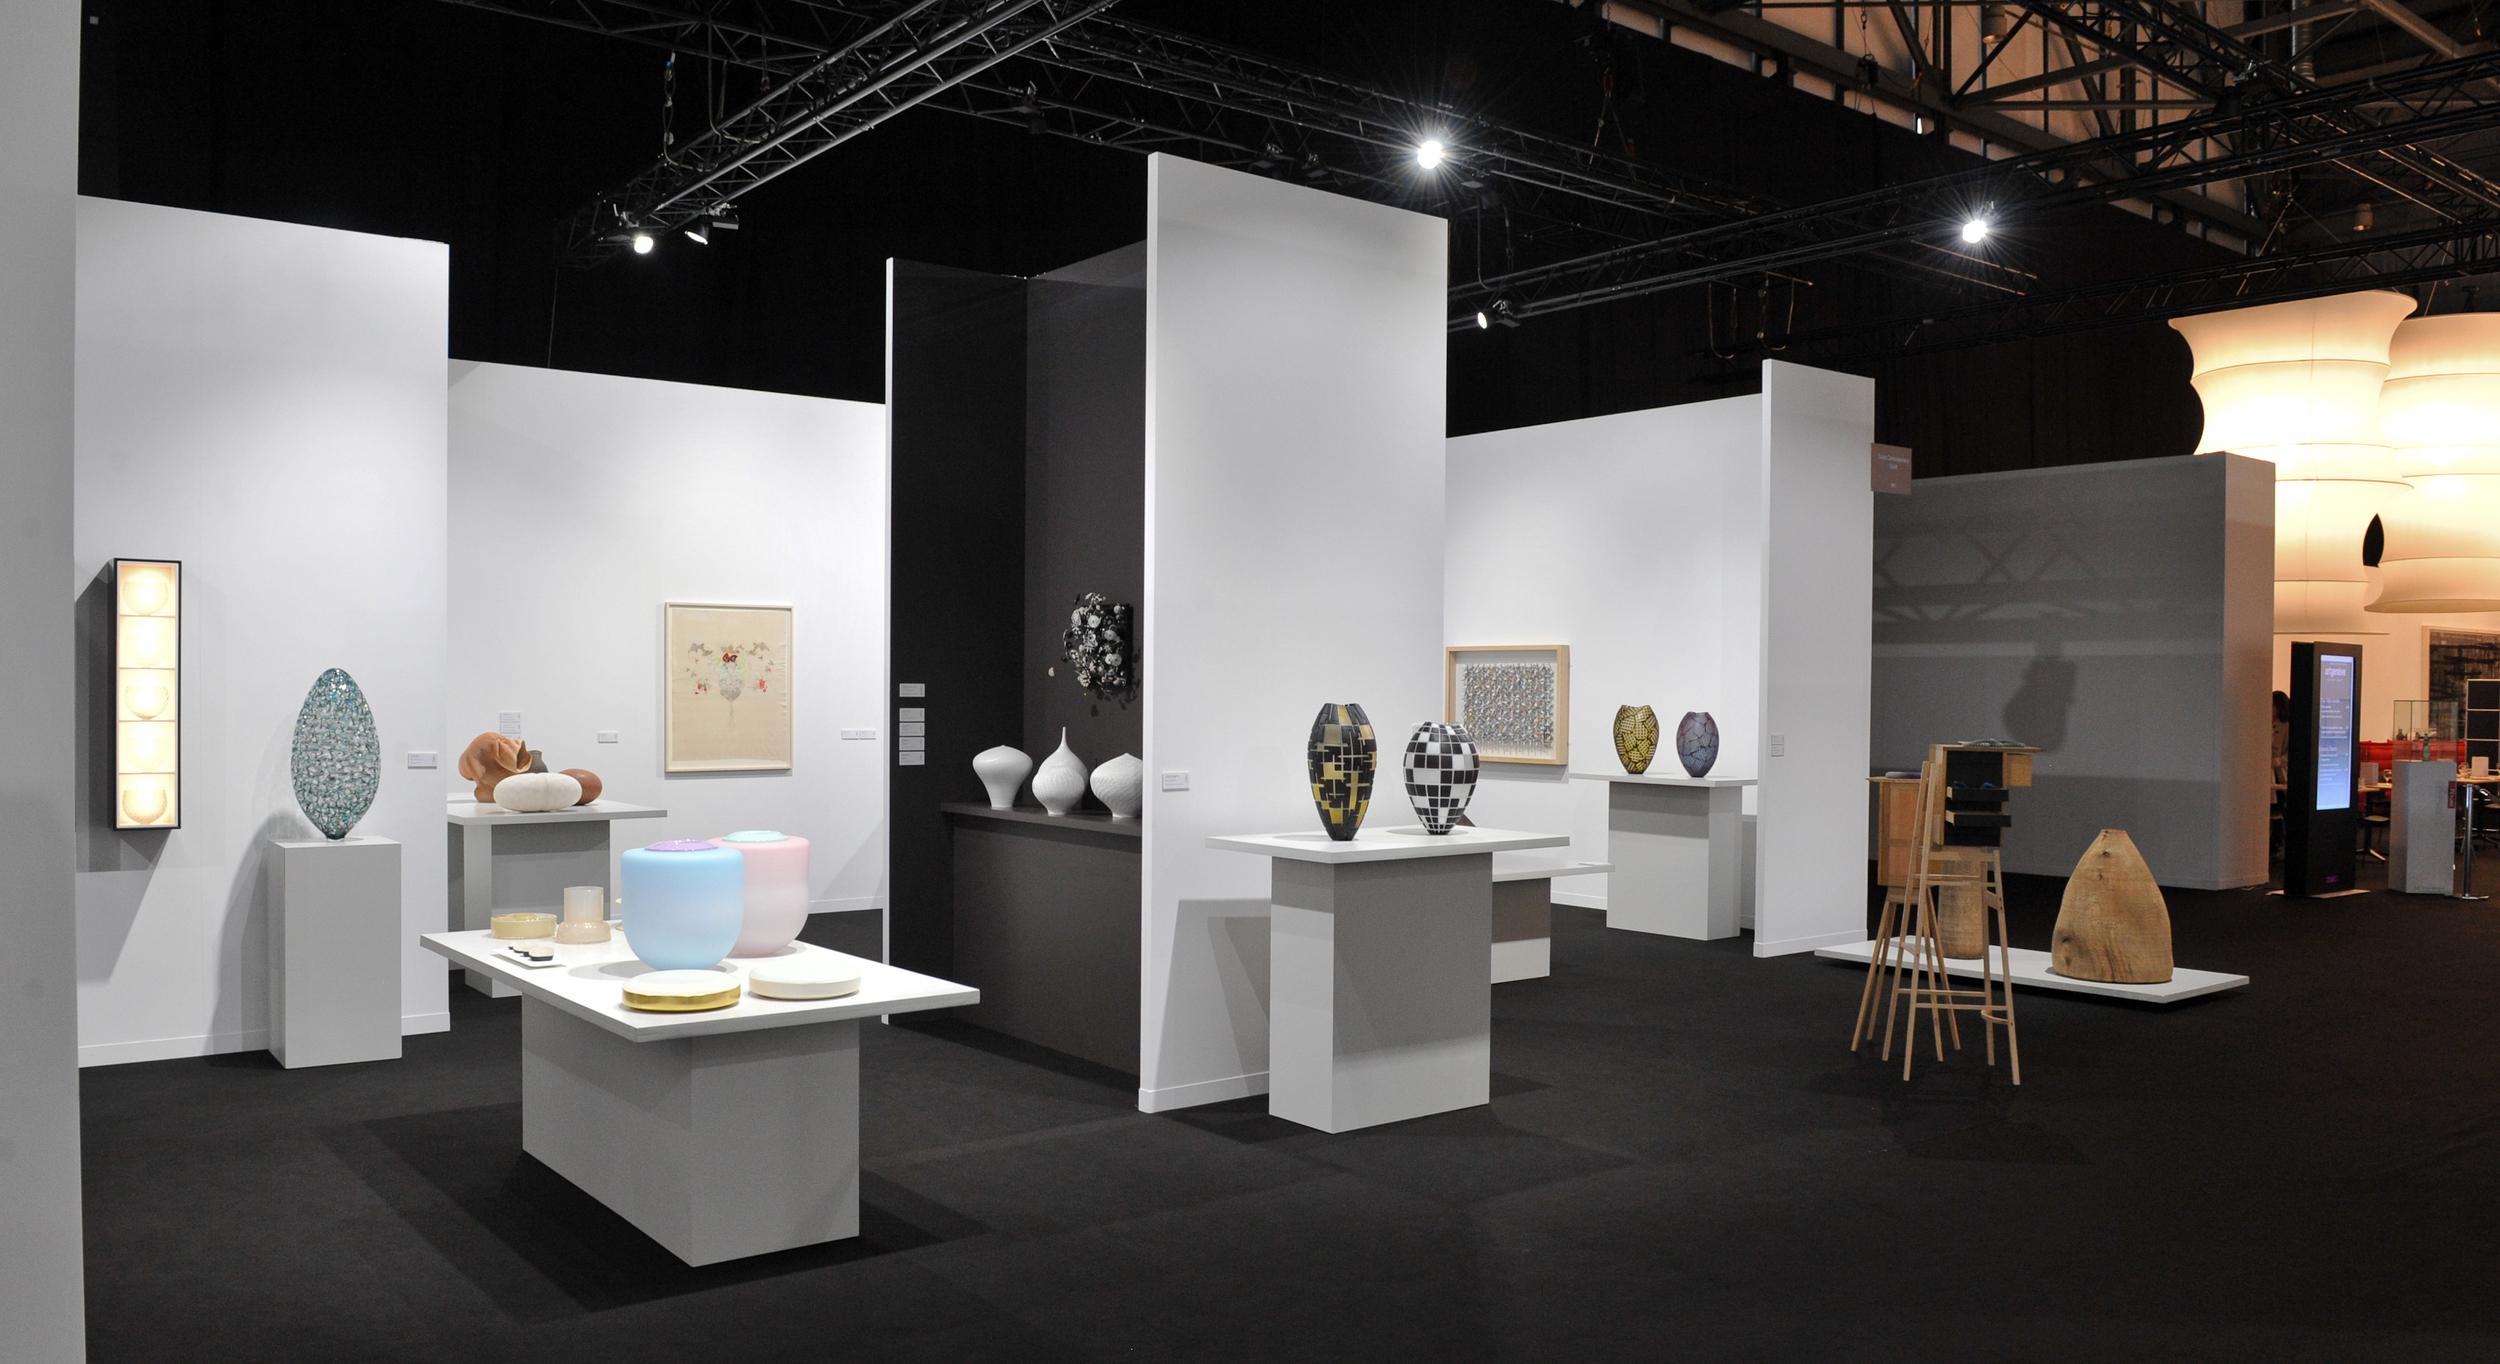 Taste contemporary craft at Art Genève 2015